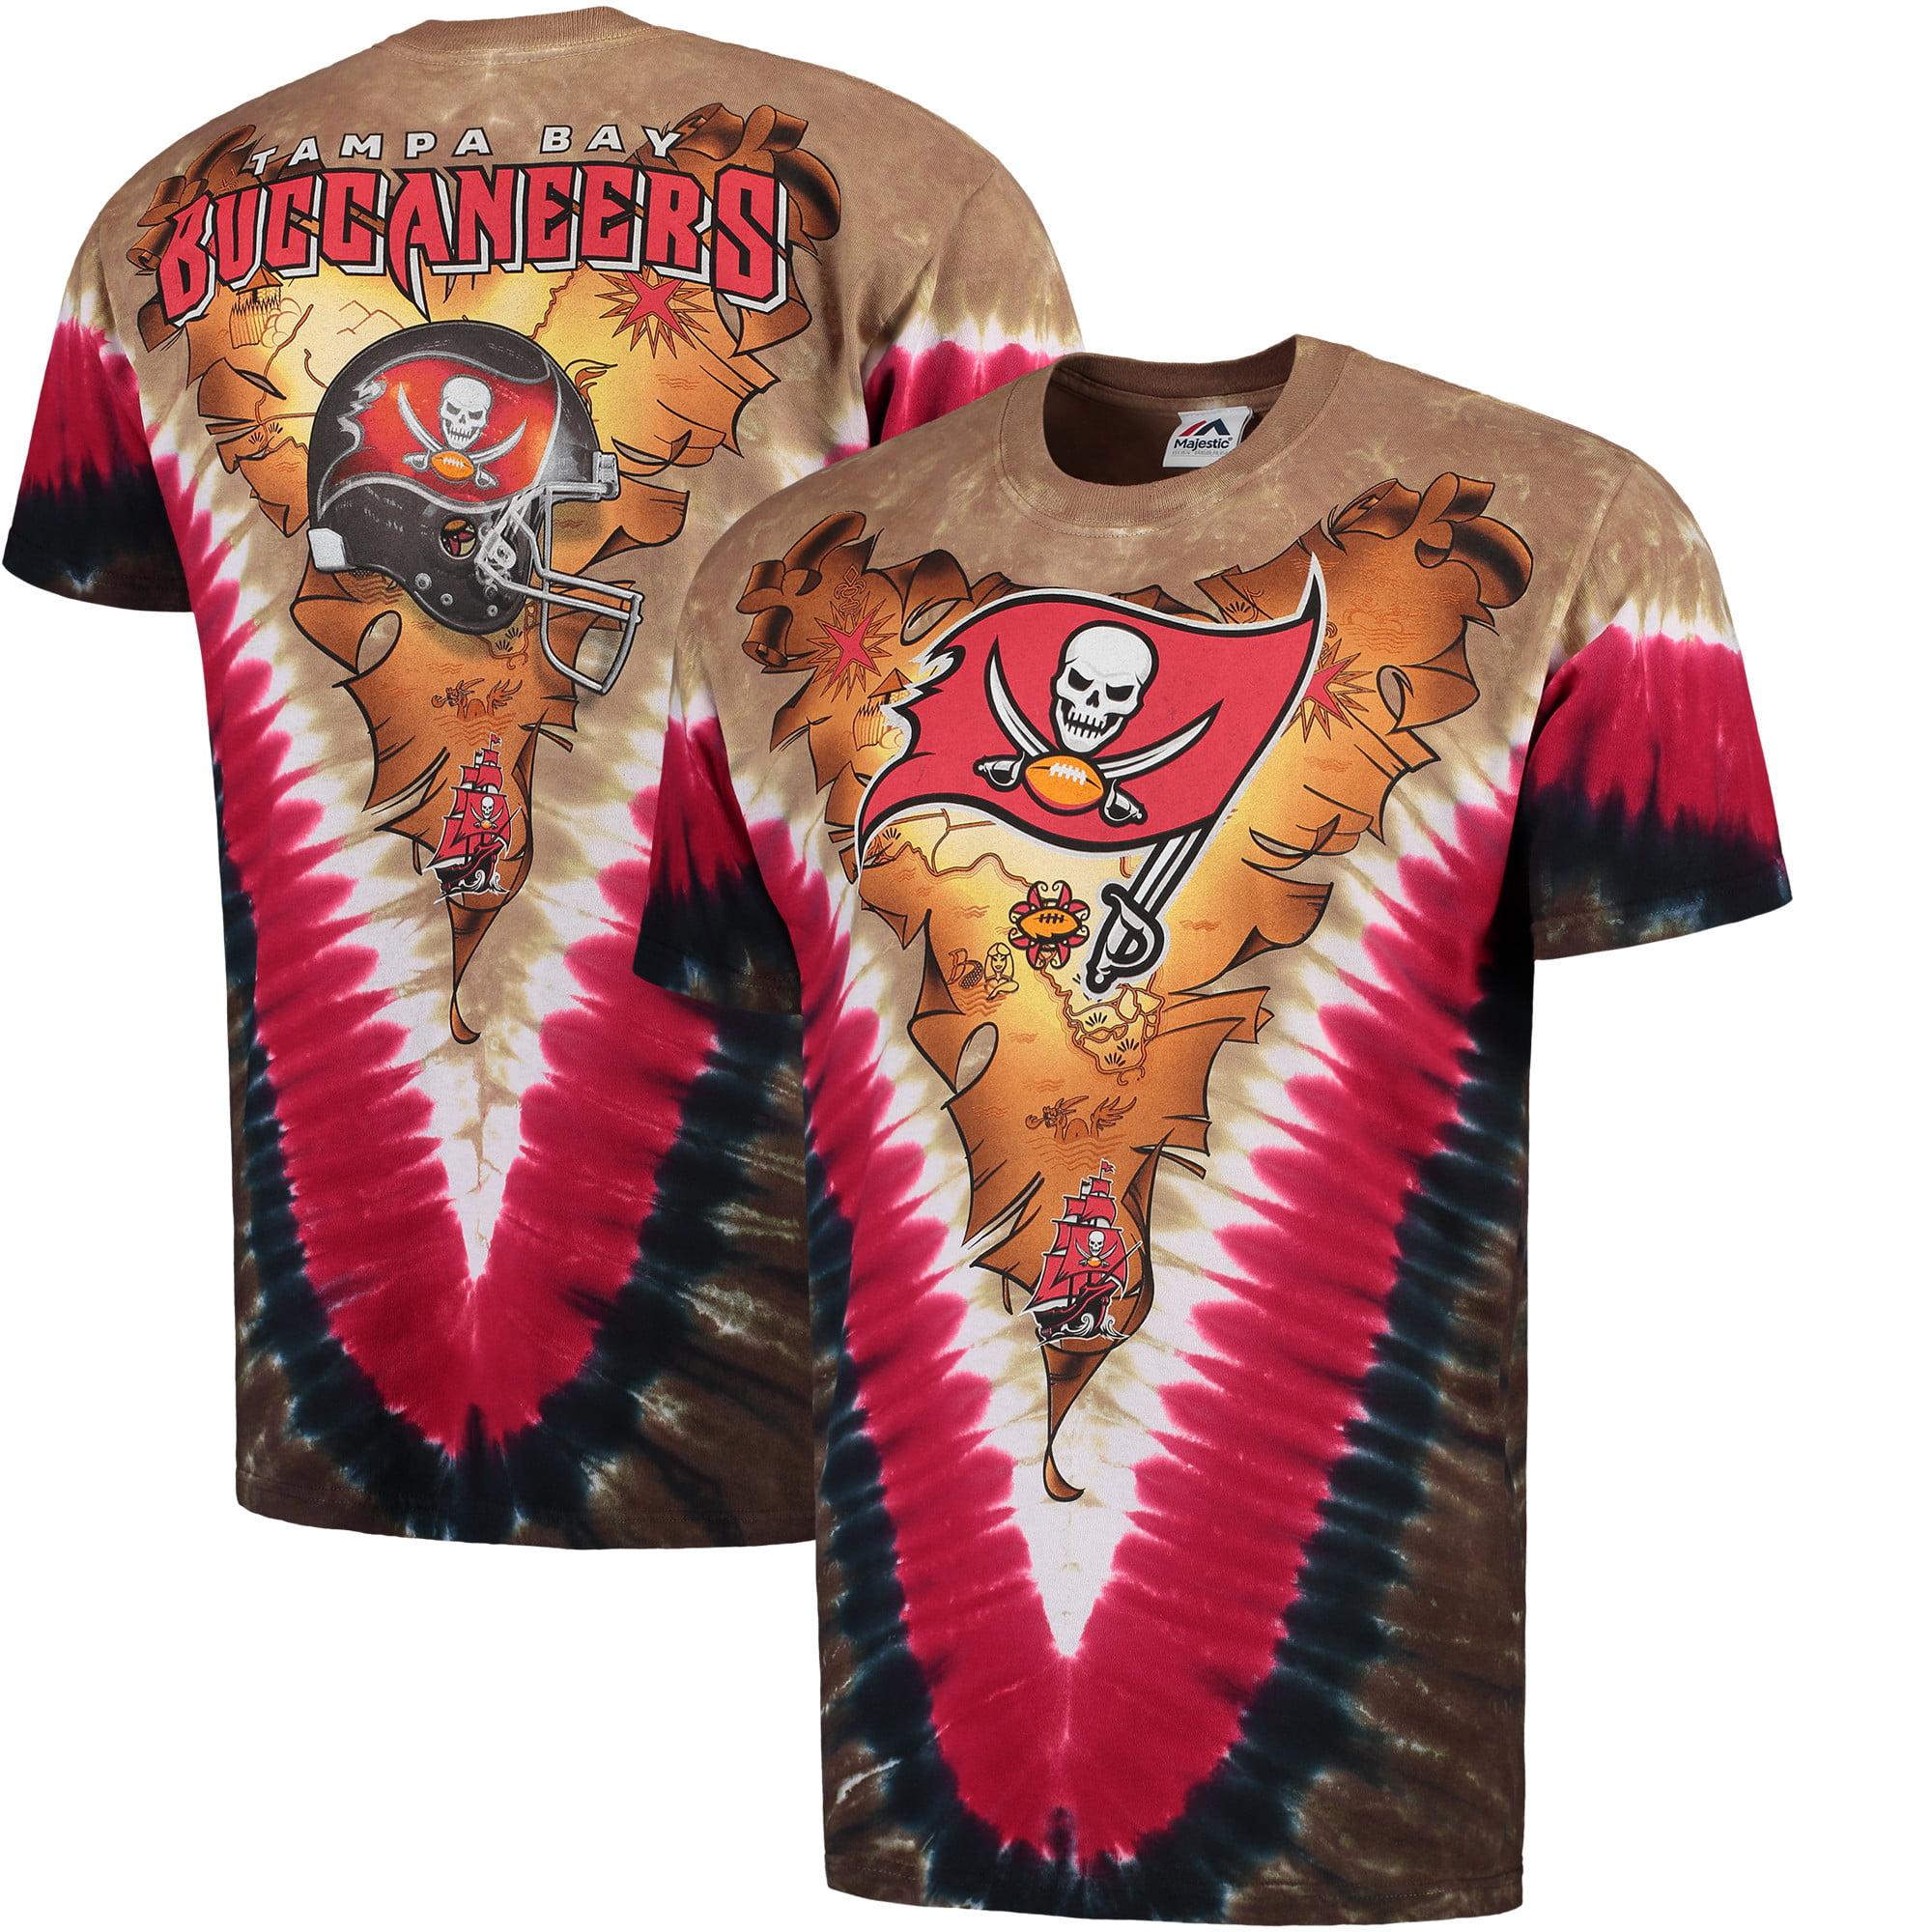 Tampa Bay Buccaneers Majestic V-Design Dye T-Shirt - Tan/Red